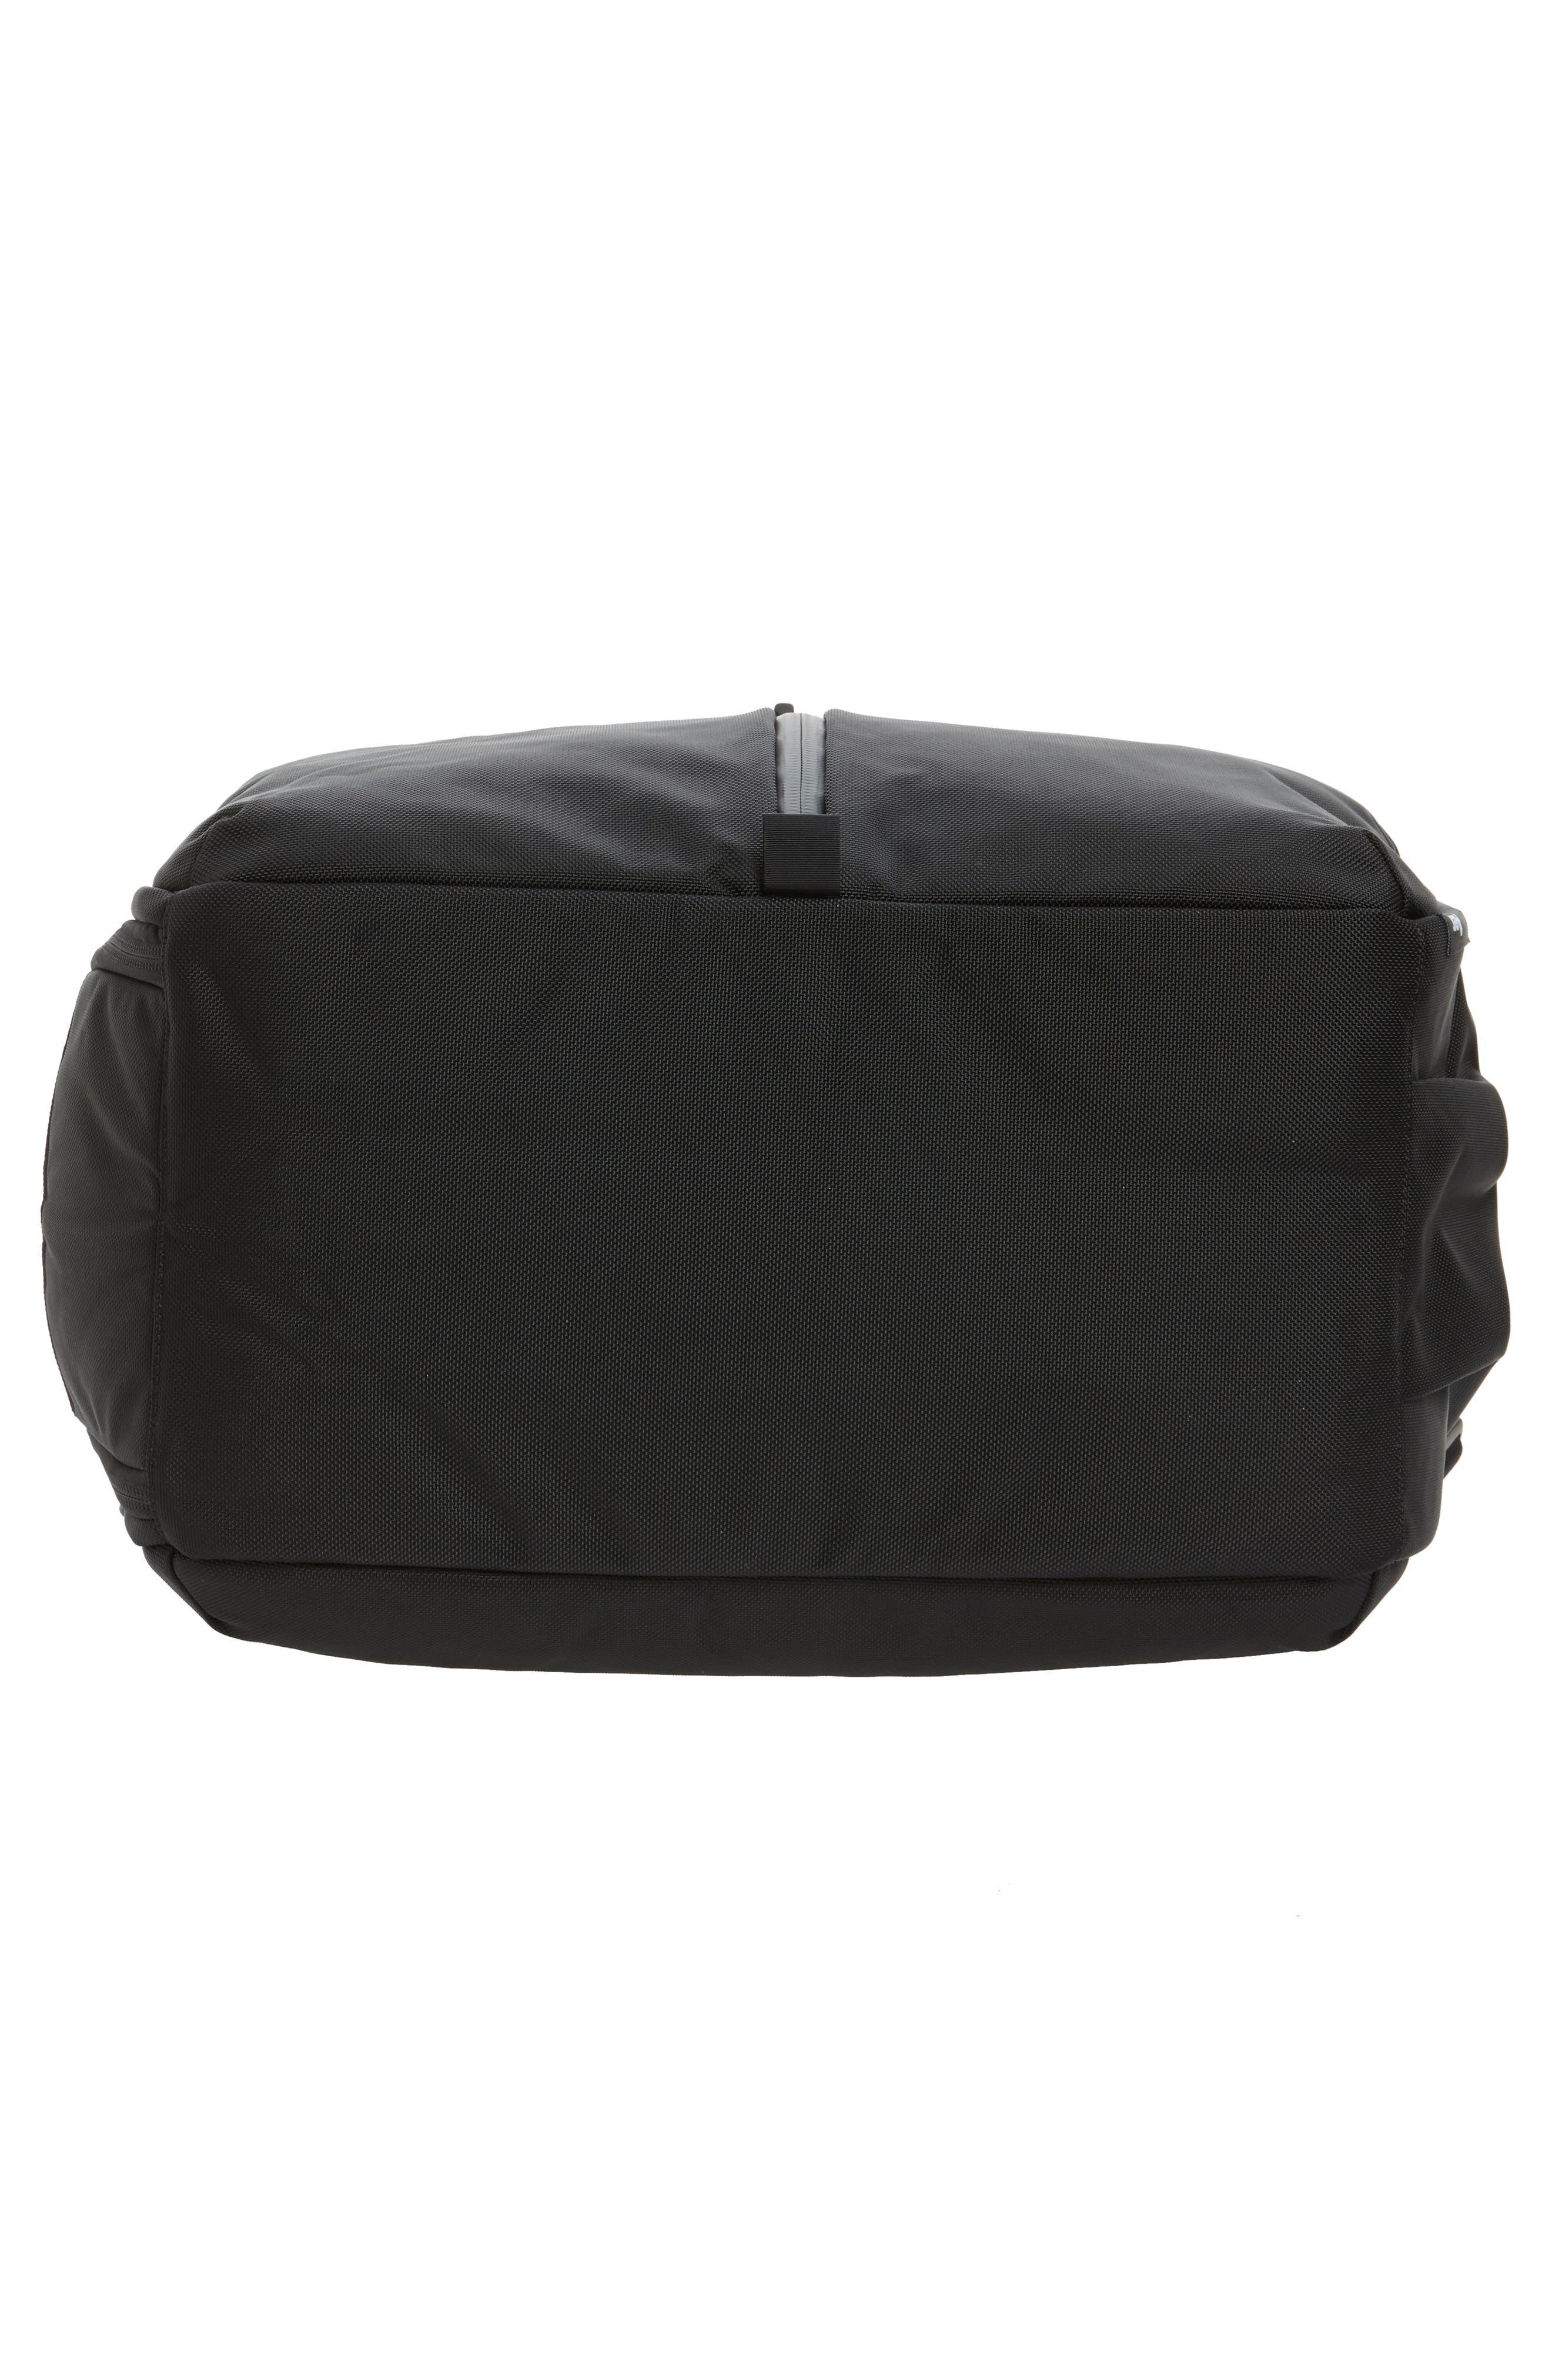 Gym Duffel 2 Bag,                             Alternate thumbnail 6, color,                             Black